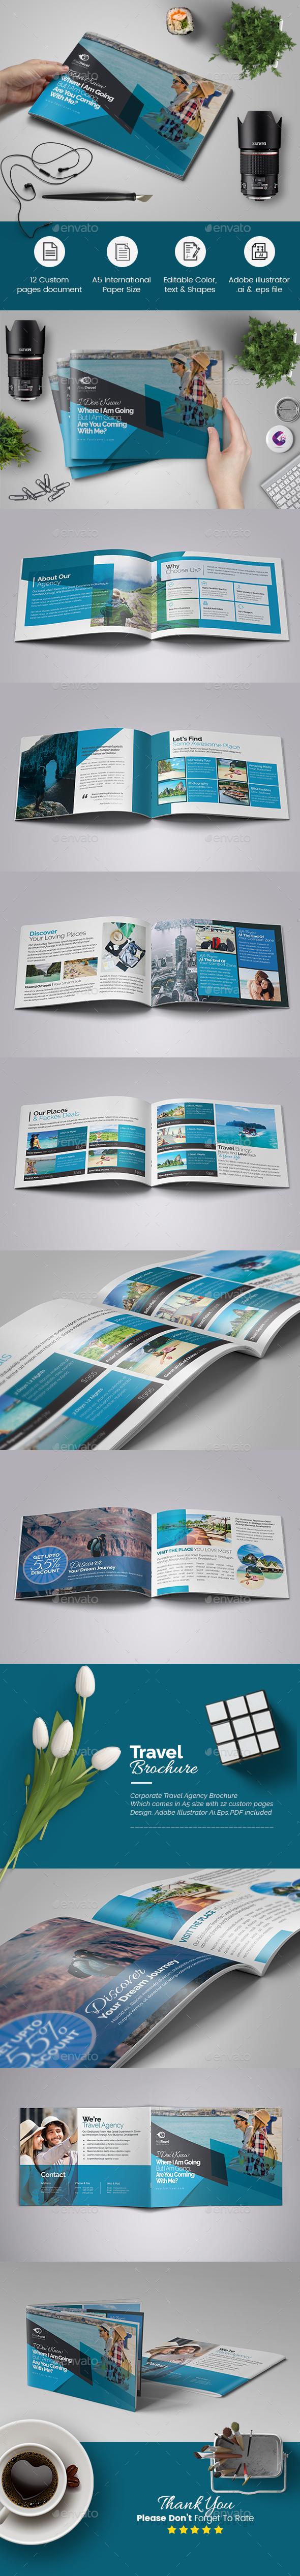 A5 Multipurpose Agency Brochure - Corporate Brochures